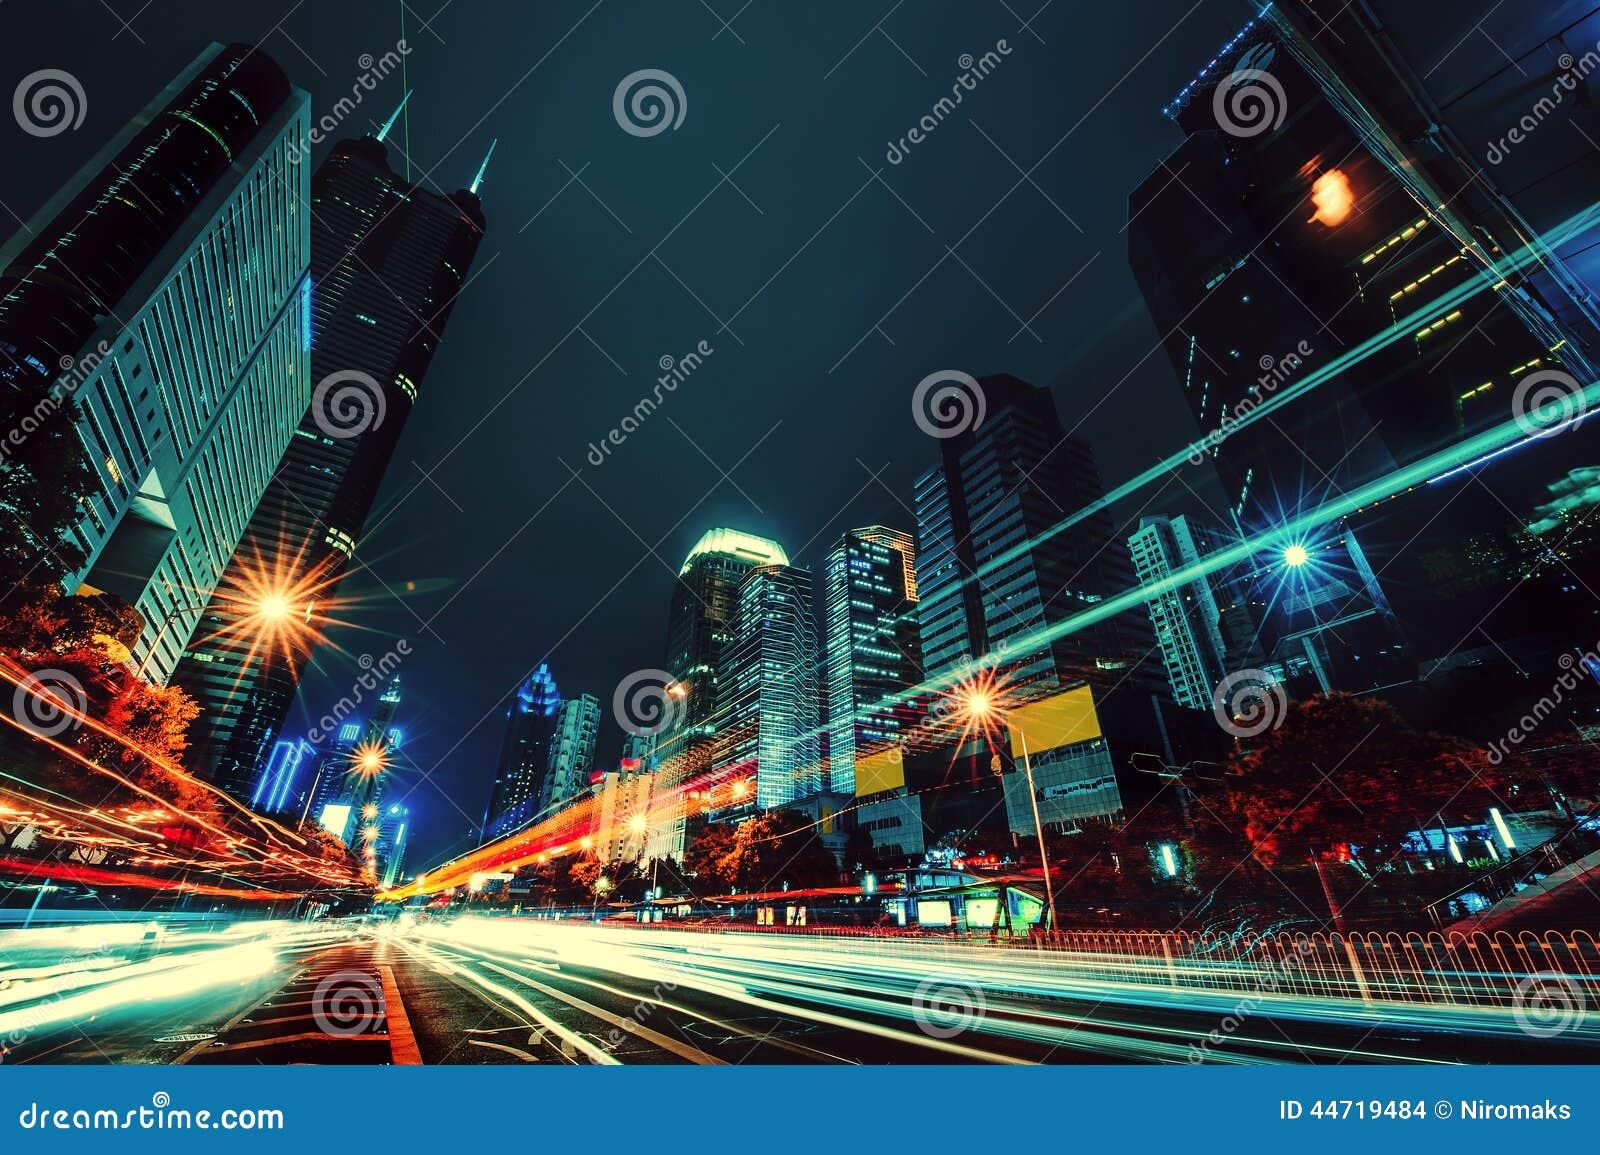 Ljuset skuggar på den moderna byggnadsbakgrunden i det shenzhen porslinet